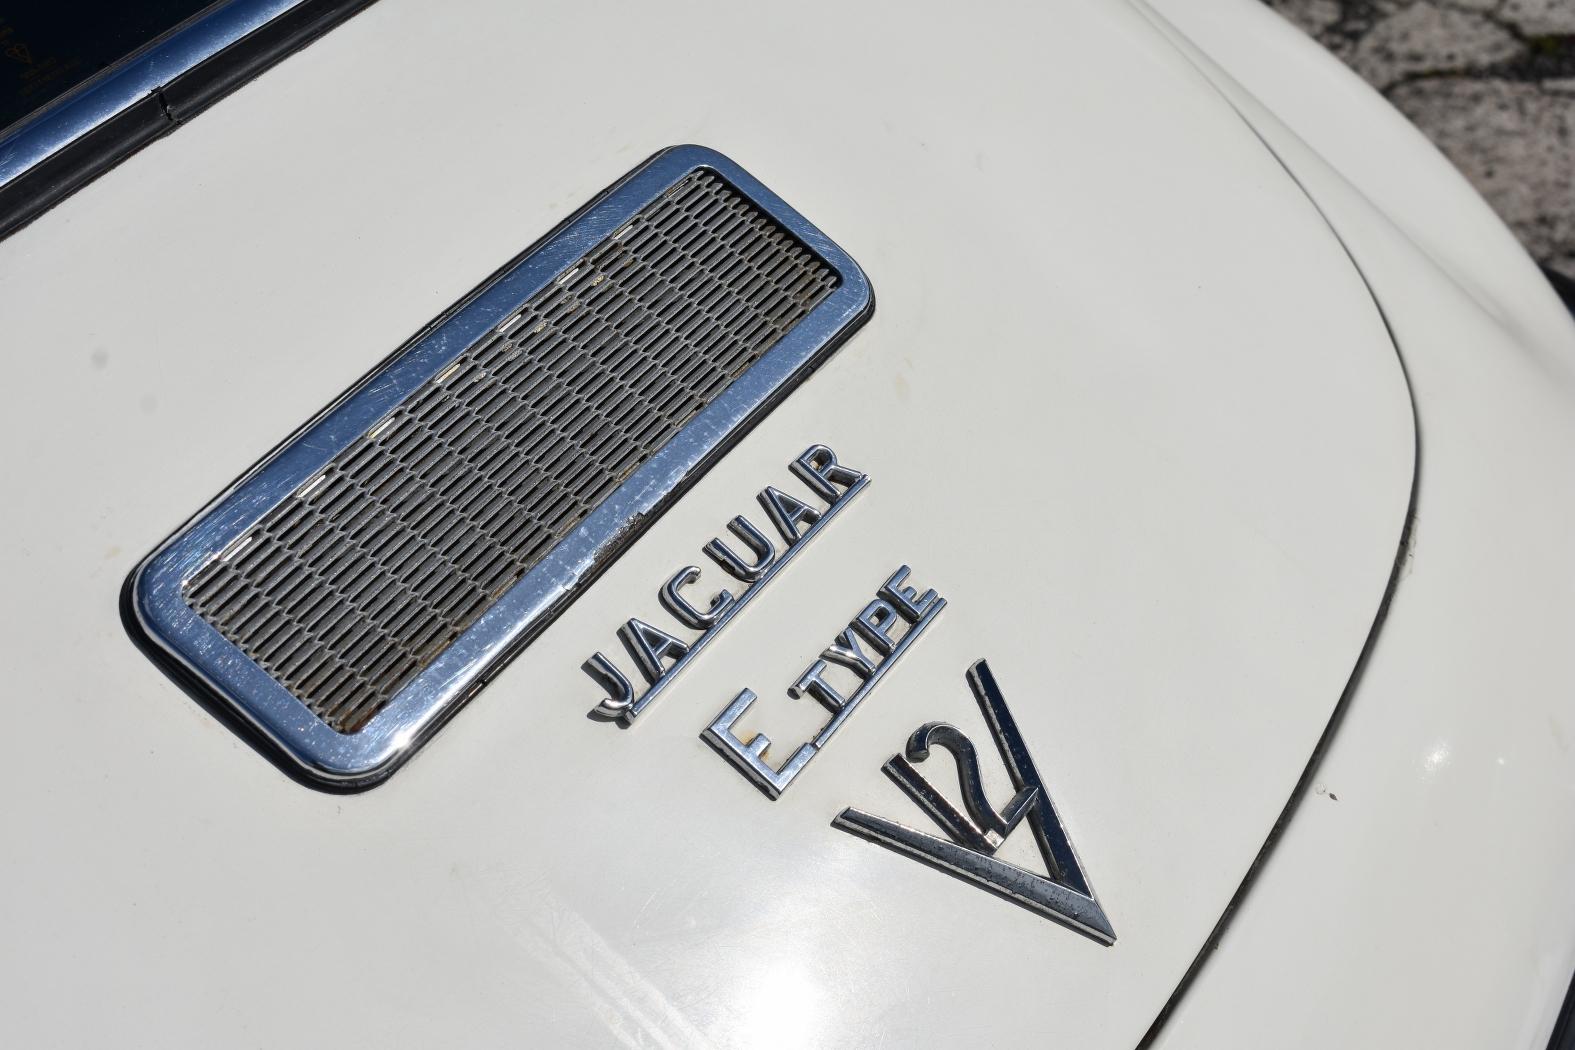 Lot 27 - A 1971 LHD Jaguar E-Type Series III